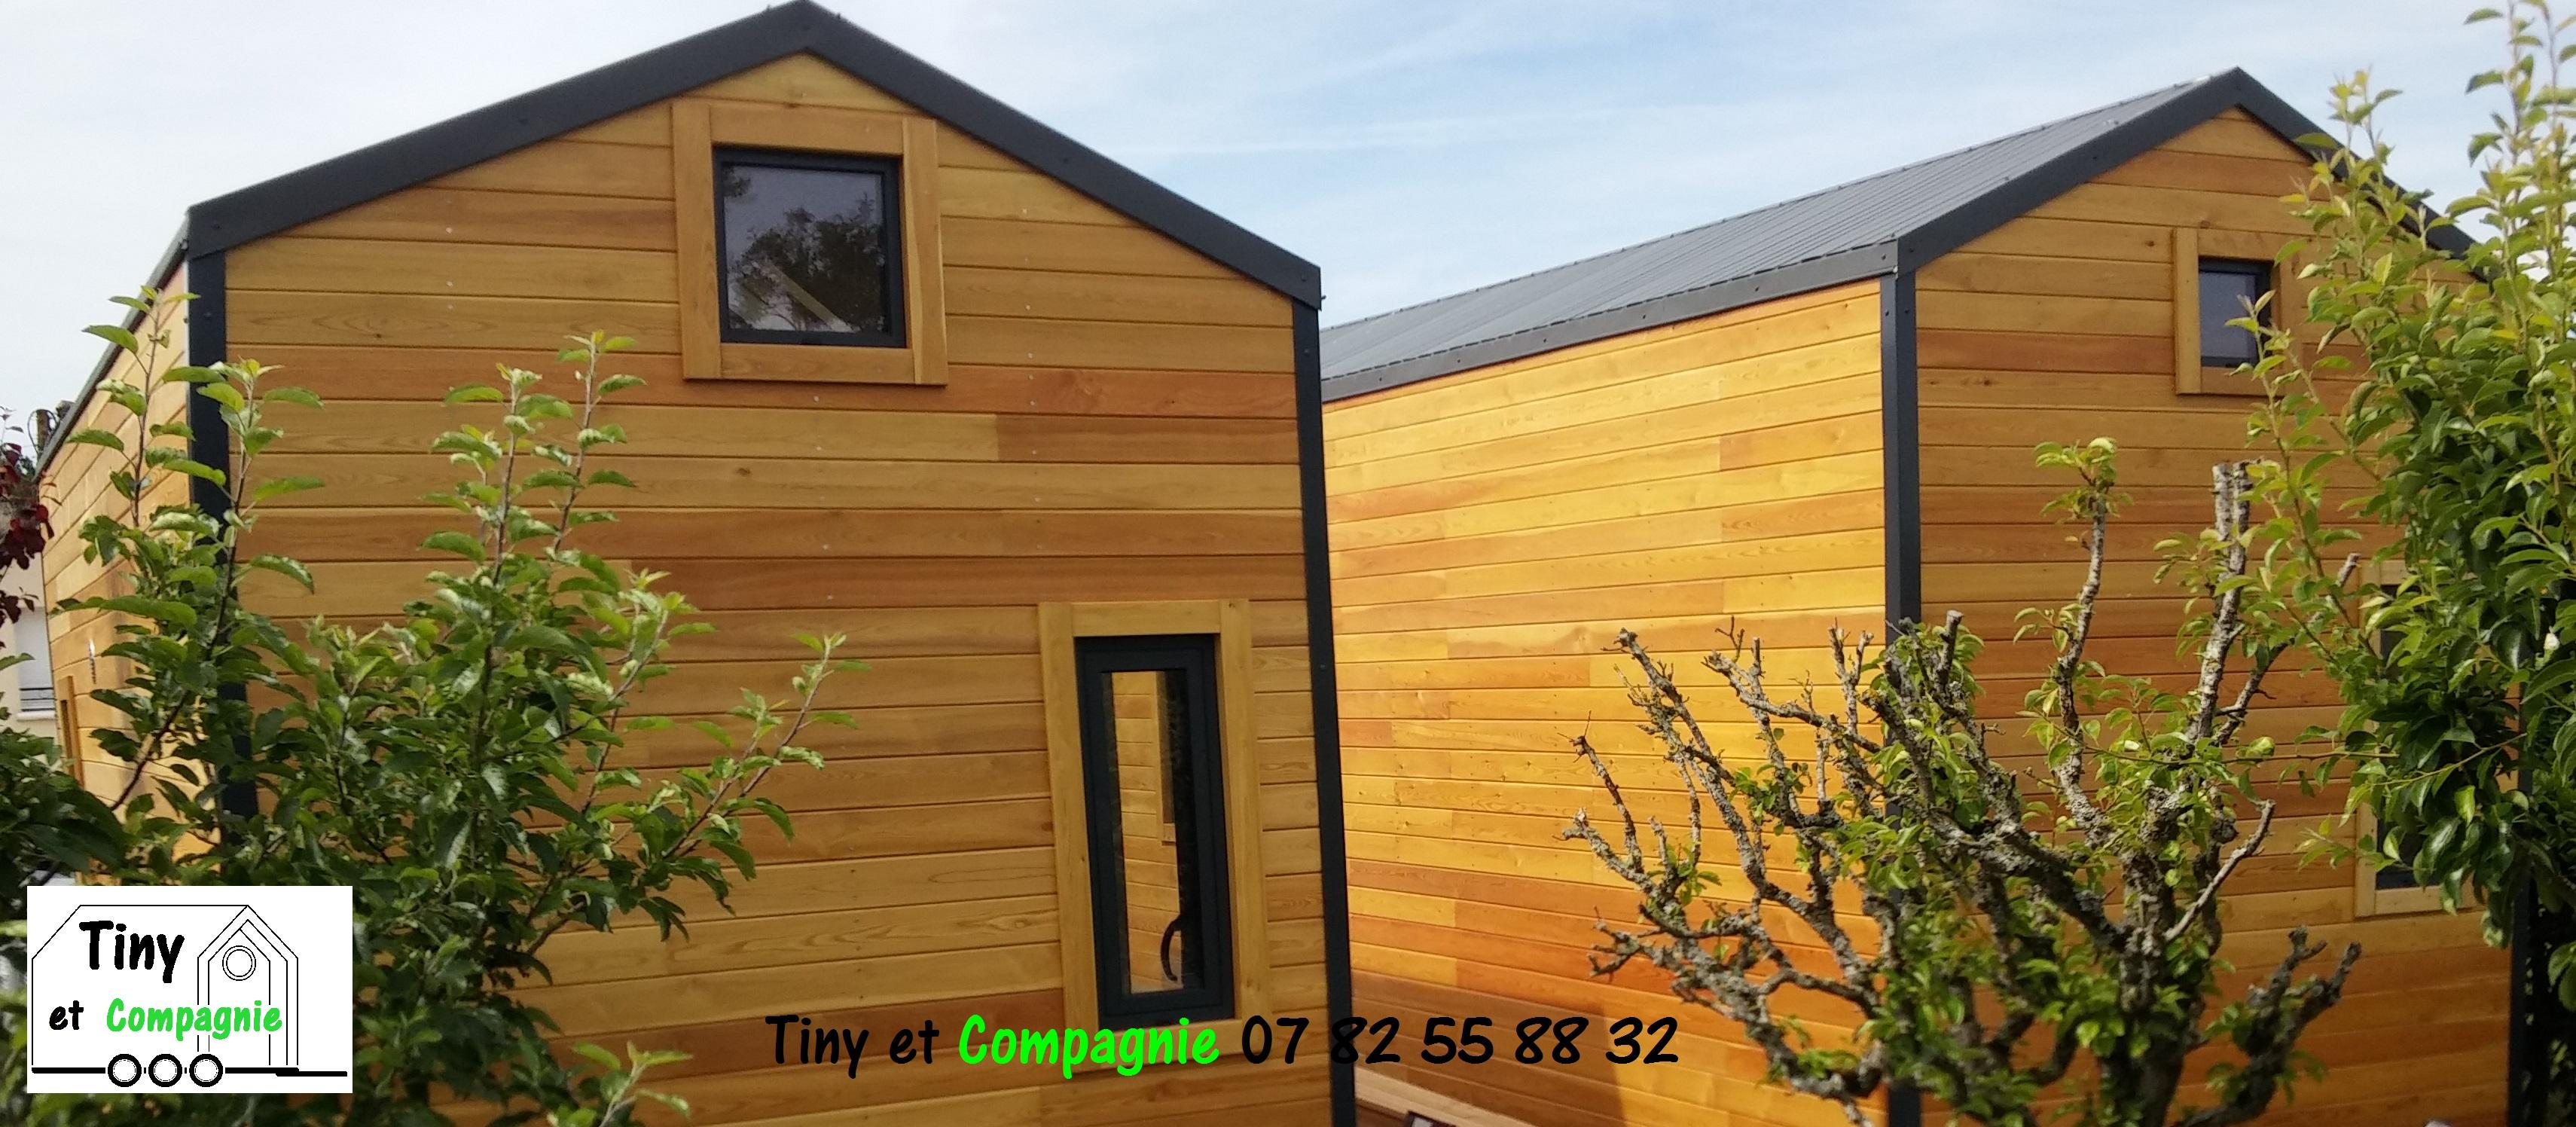 Tiny et Compagnie - Cabana 2019 (Jumelle